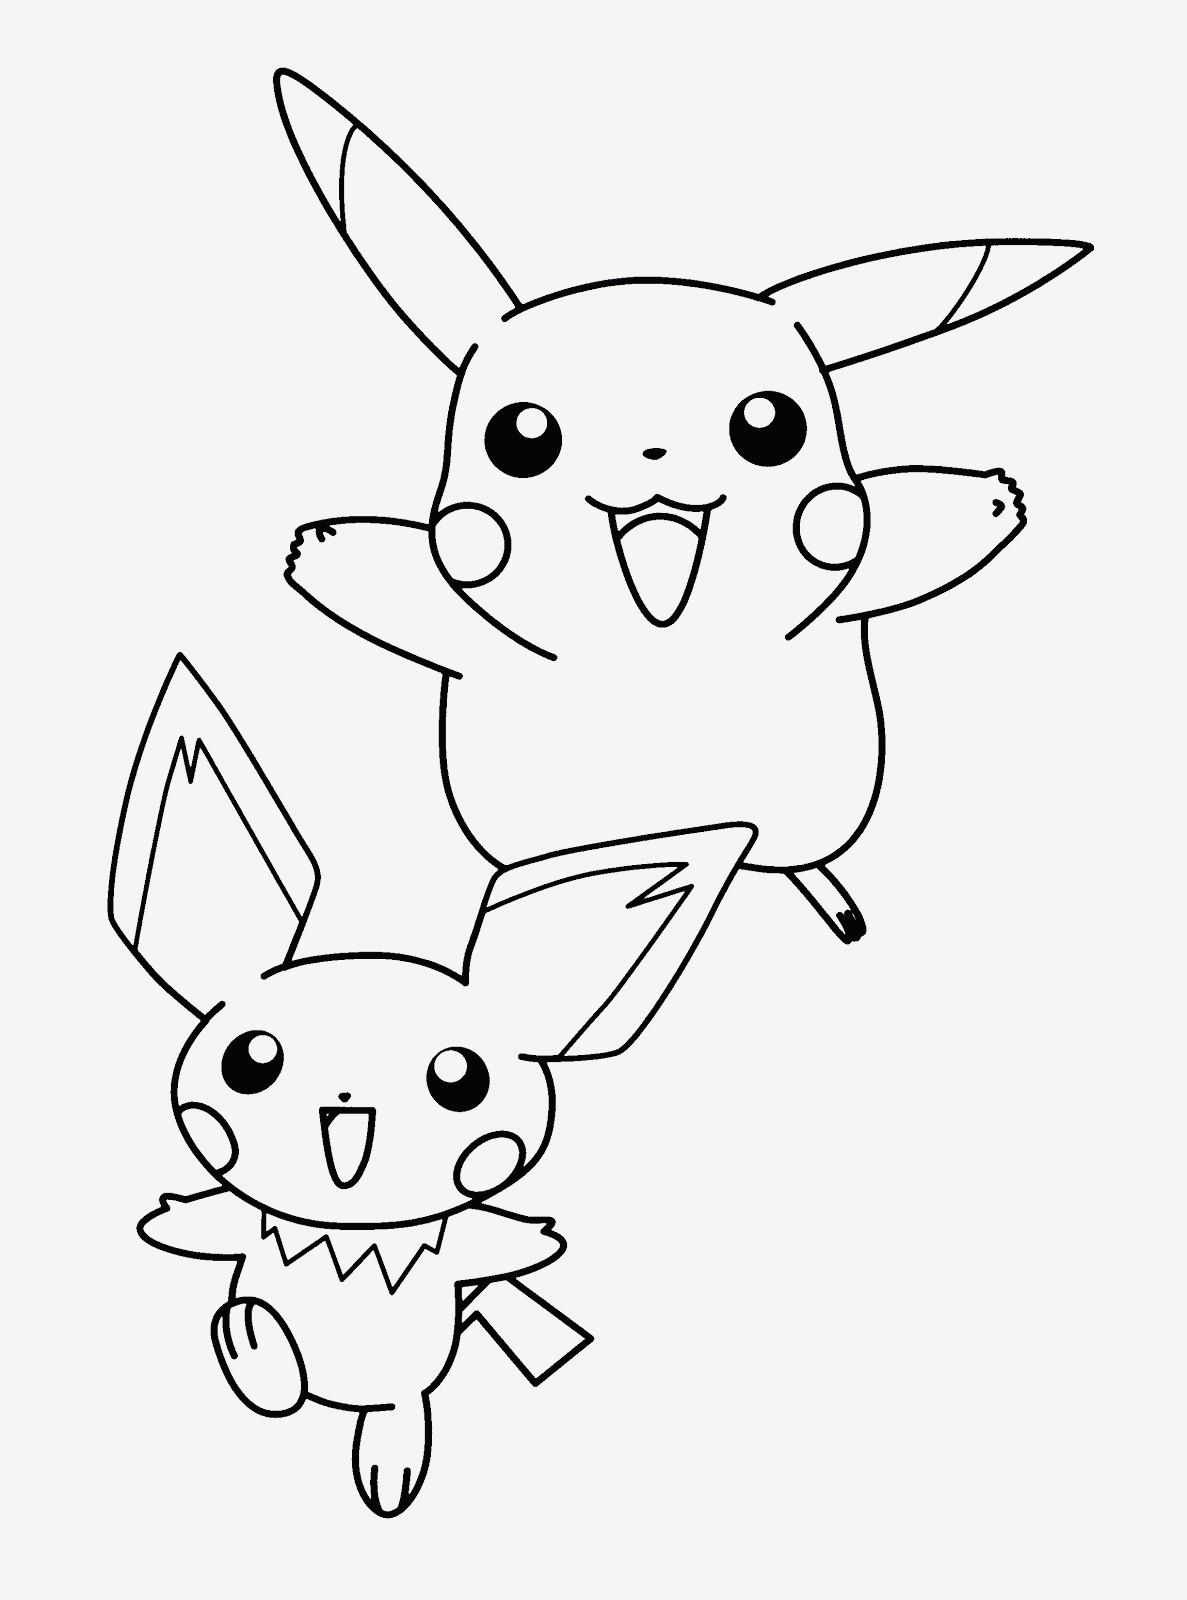 99 Genial Pokemon Ausmalbilder Kostenlos Stock | Kinder Bilder  99 Genial Pokem...